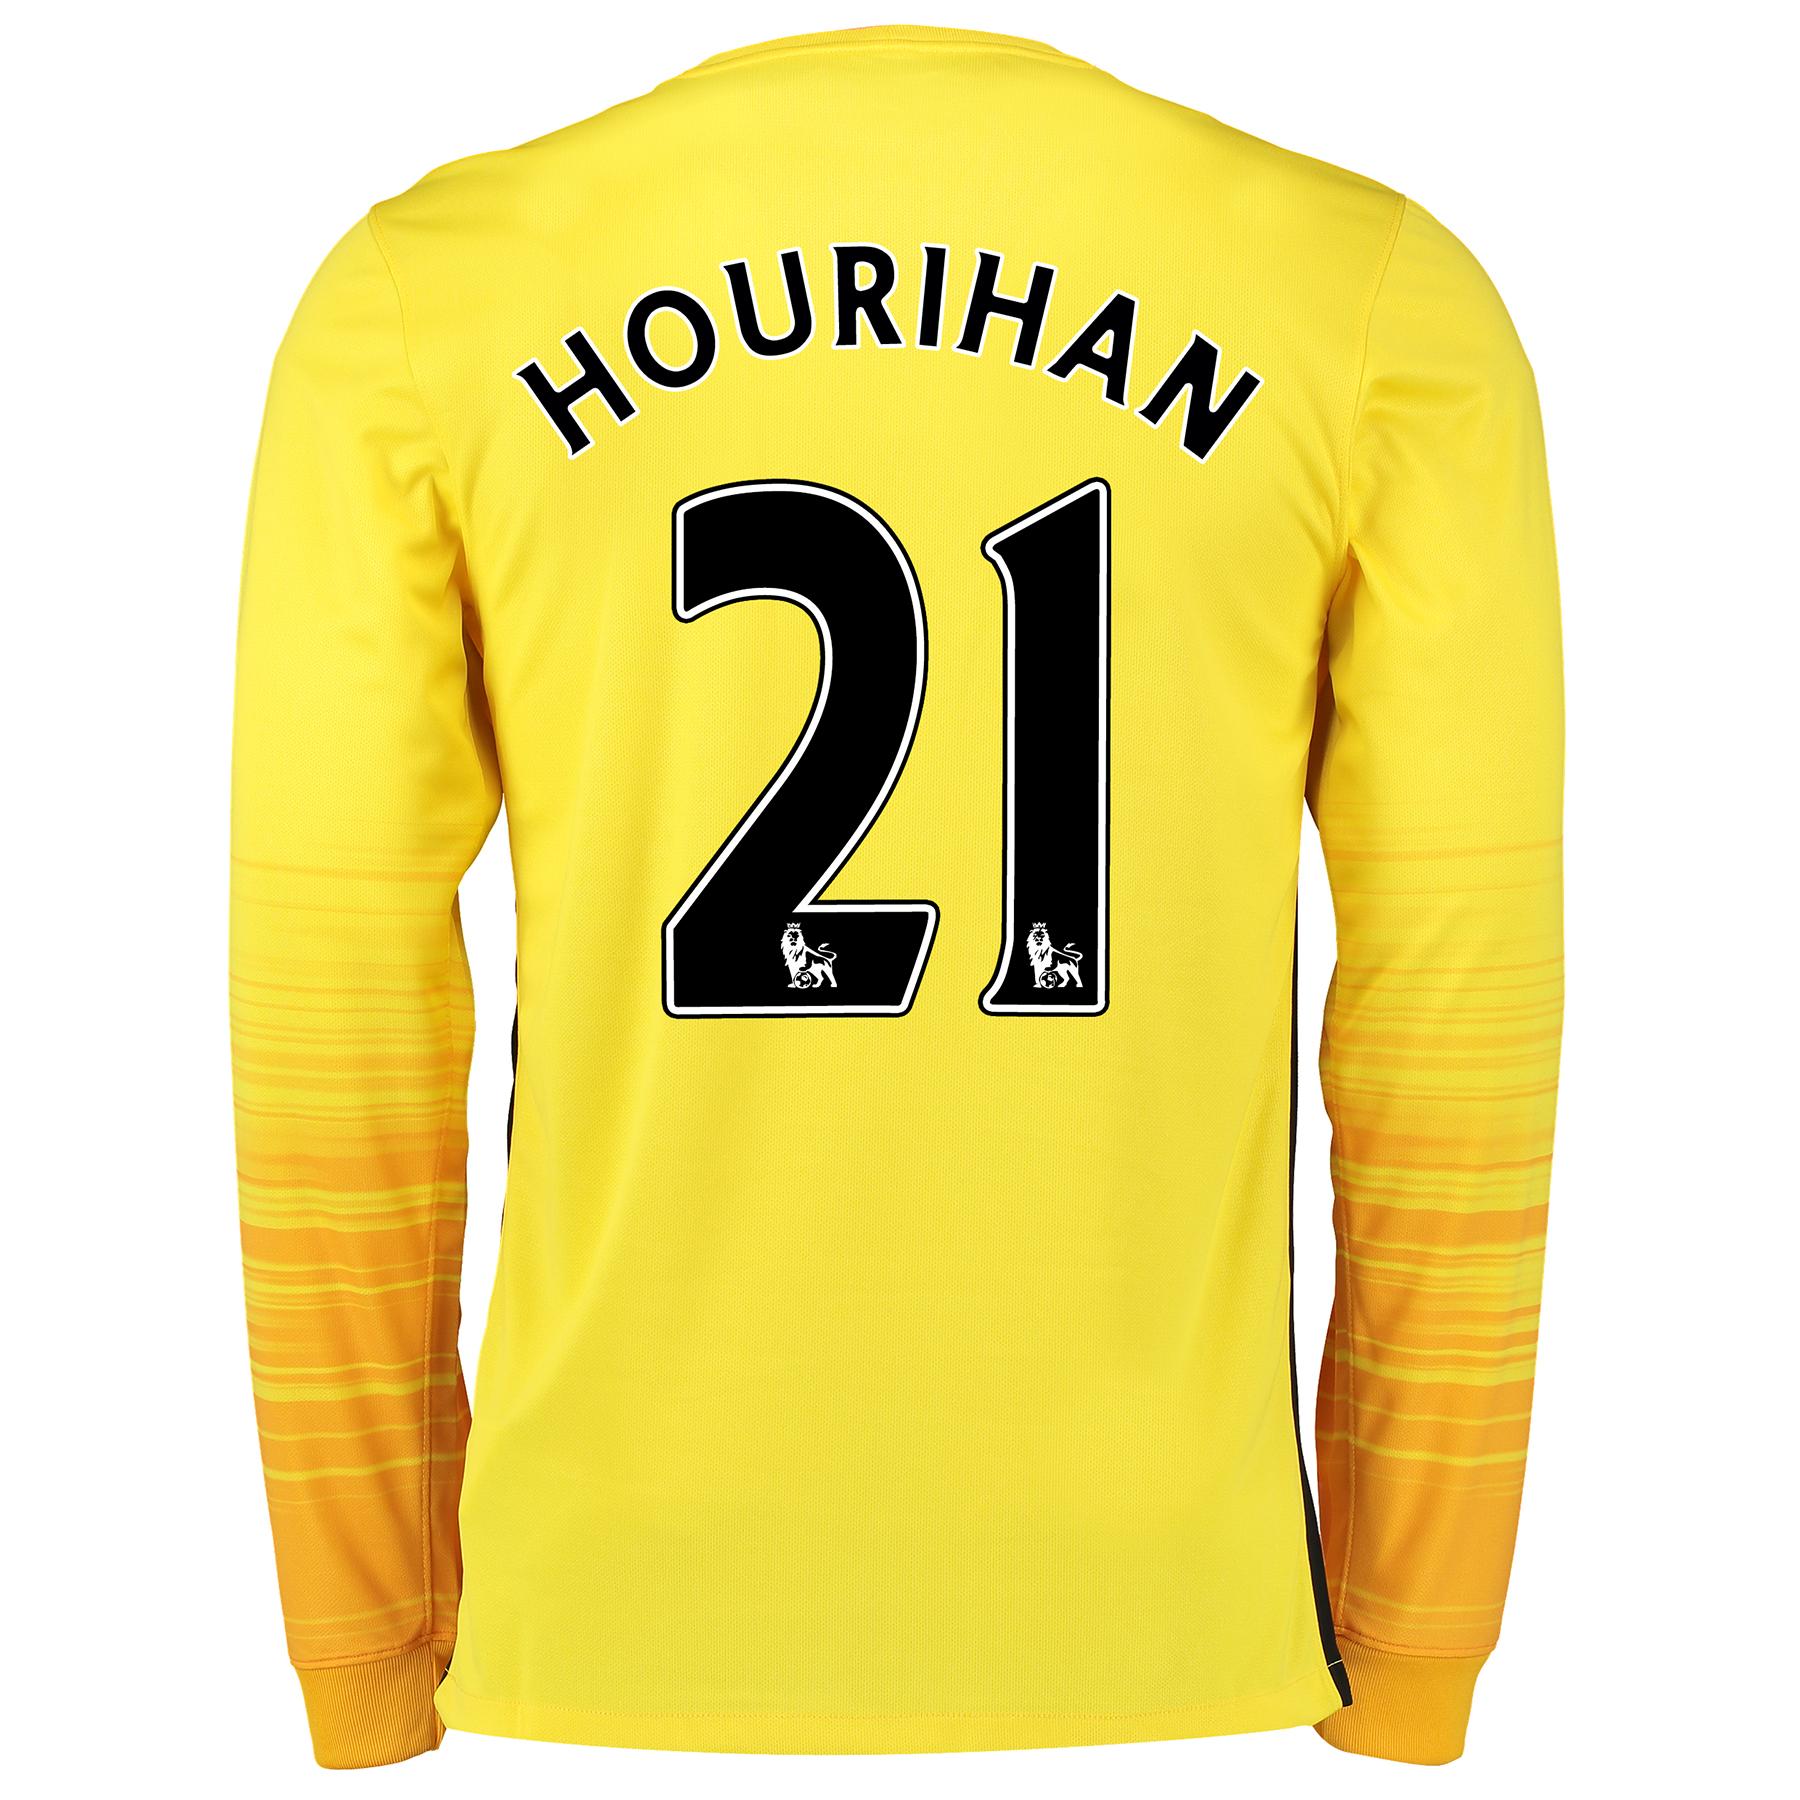 Manchester City Women 2nd Choice Goalkeeper Shirt 2015/16 Yellow with